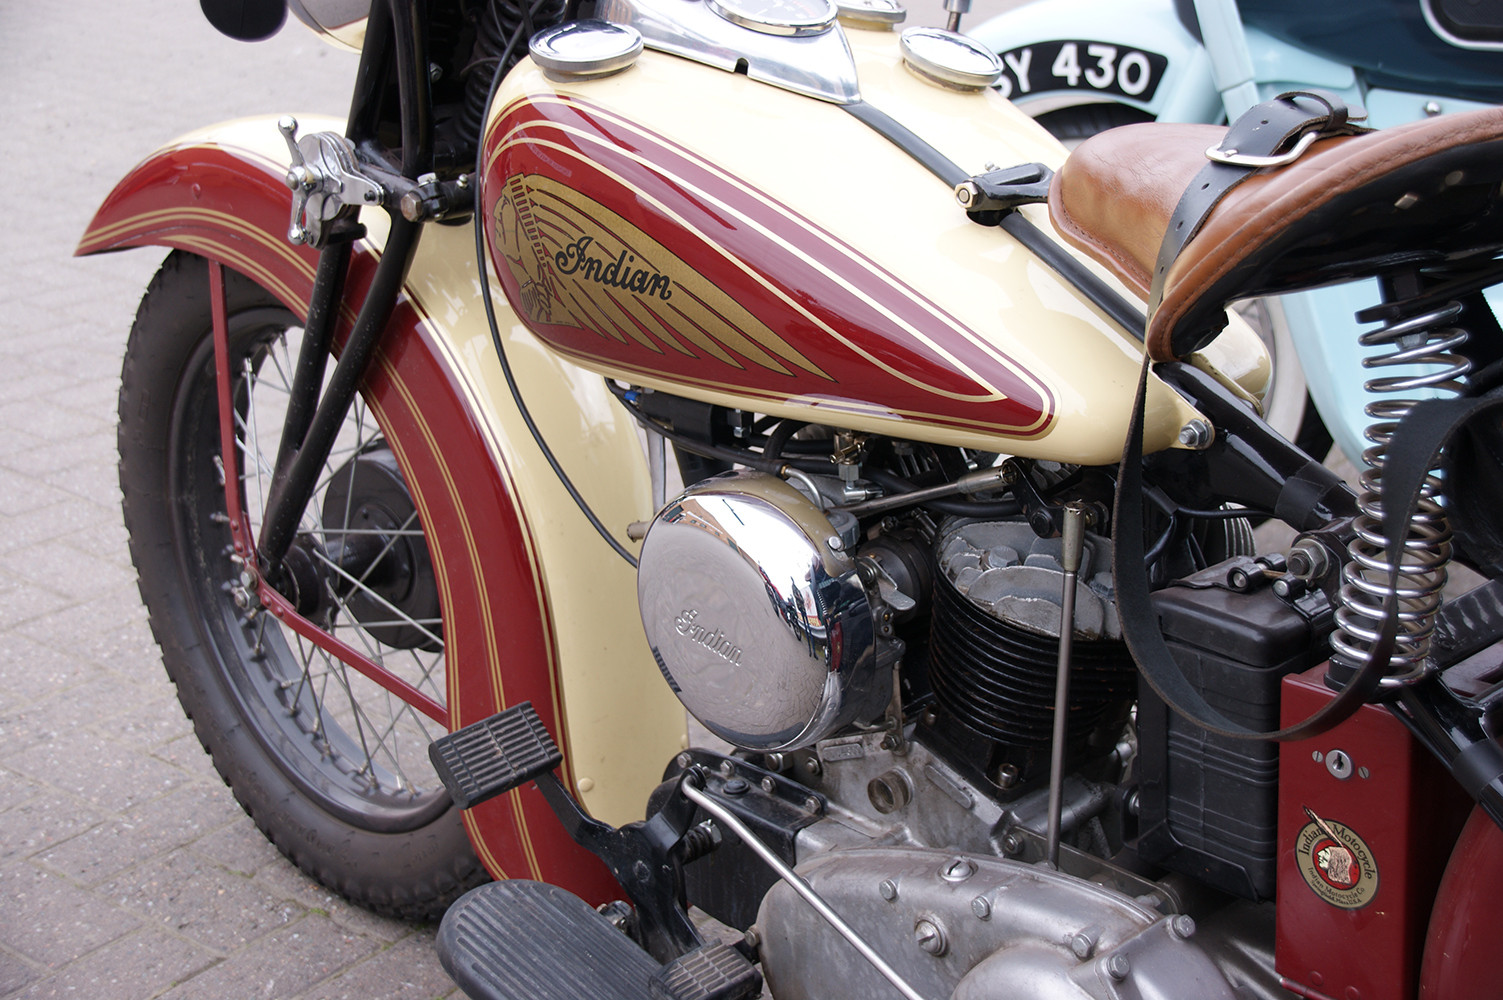 Vintage motor bikes